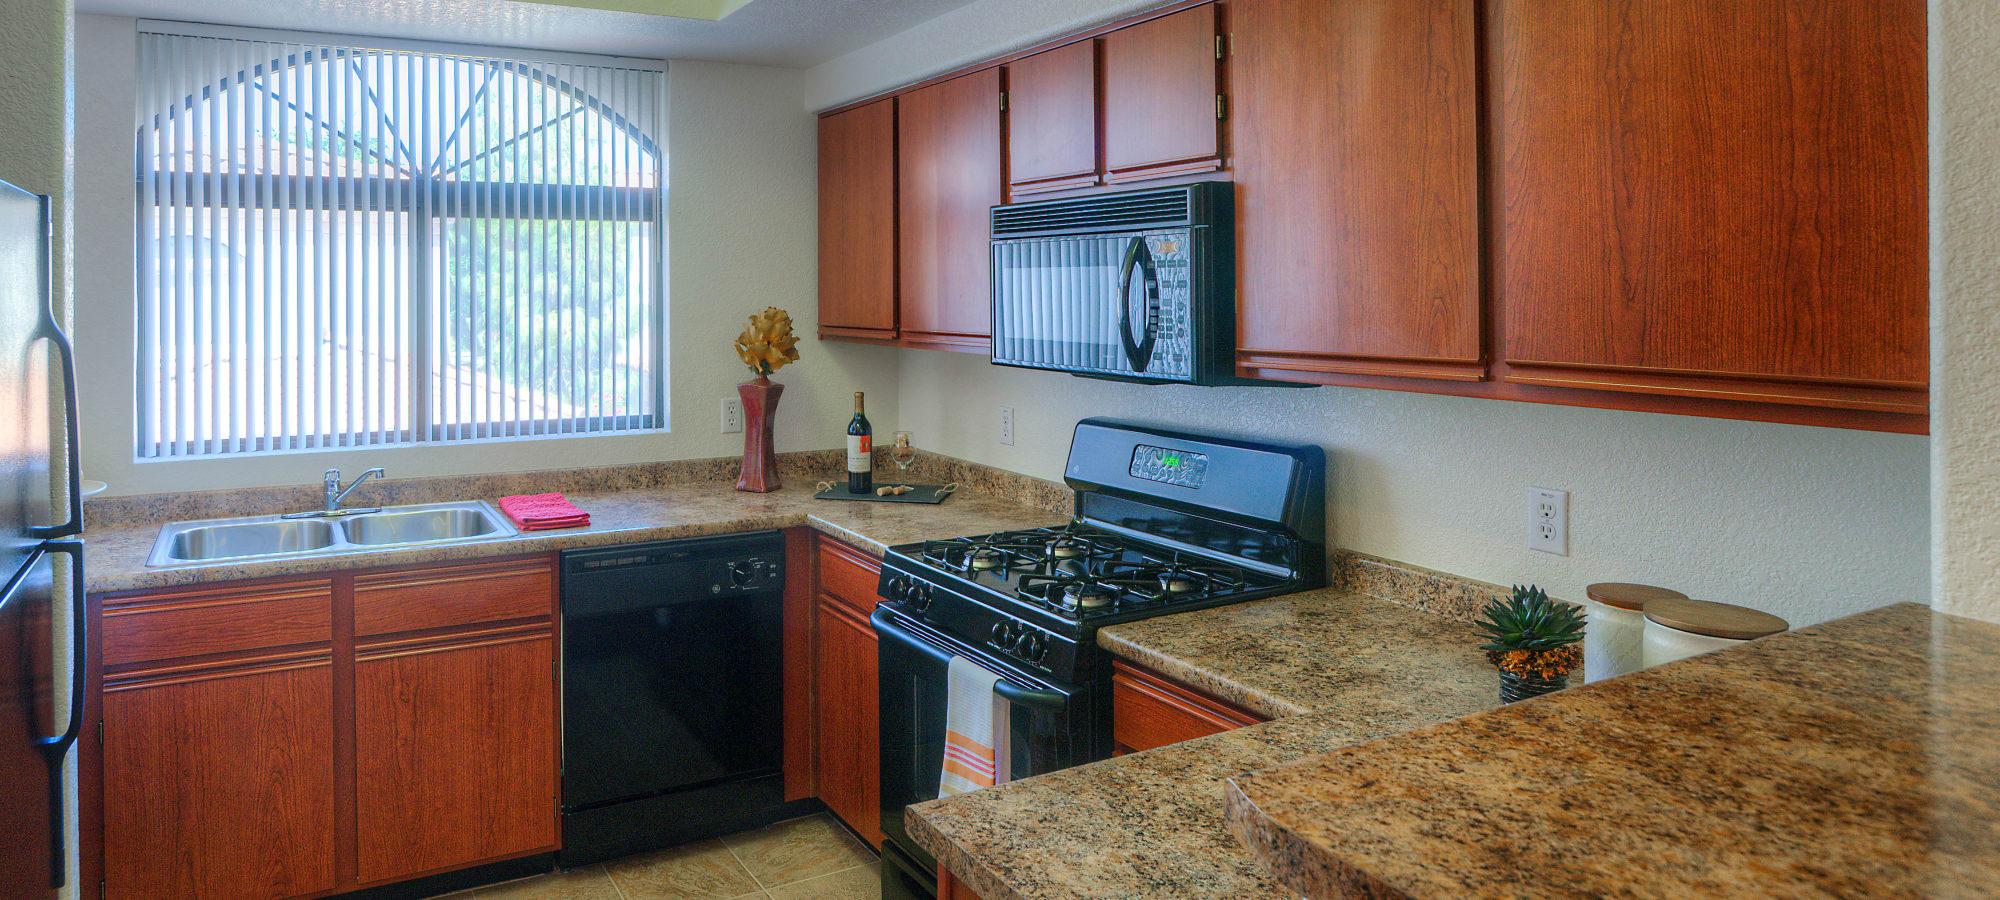 Kitchen featuring granite countertops at San Prado in Glendale, Arizona